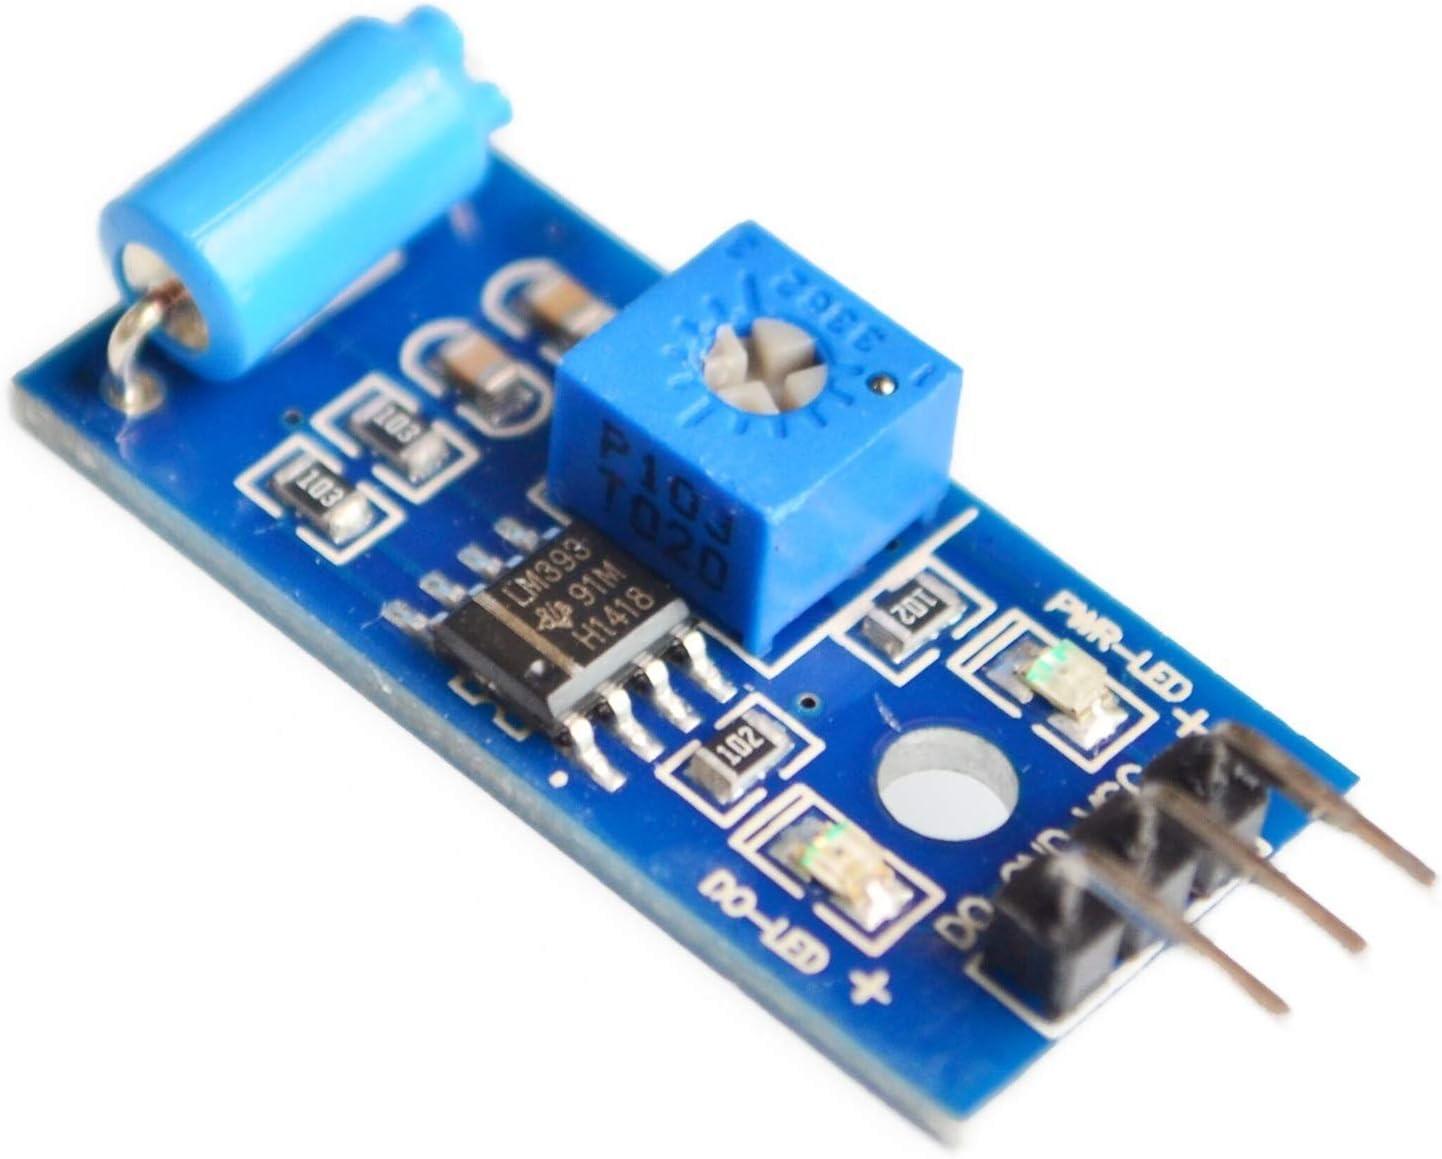 LanGuShi Useful 10PCS LOT SW-420 Alarm Sensor Module Sens Motion Max 89% Popular shop is the lowest price challenge OFF